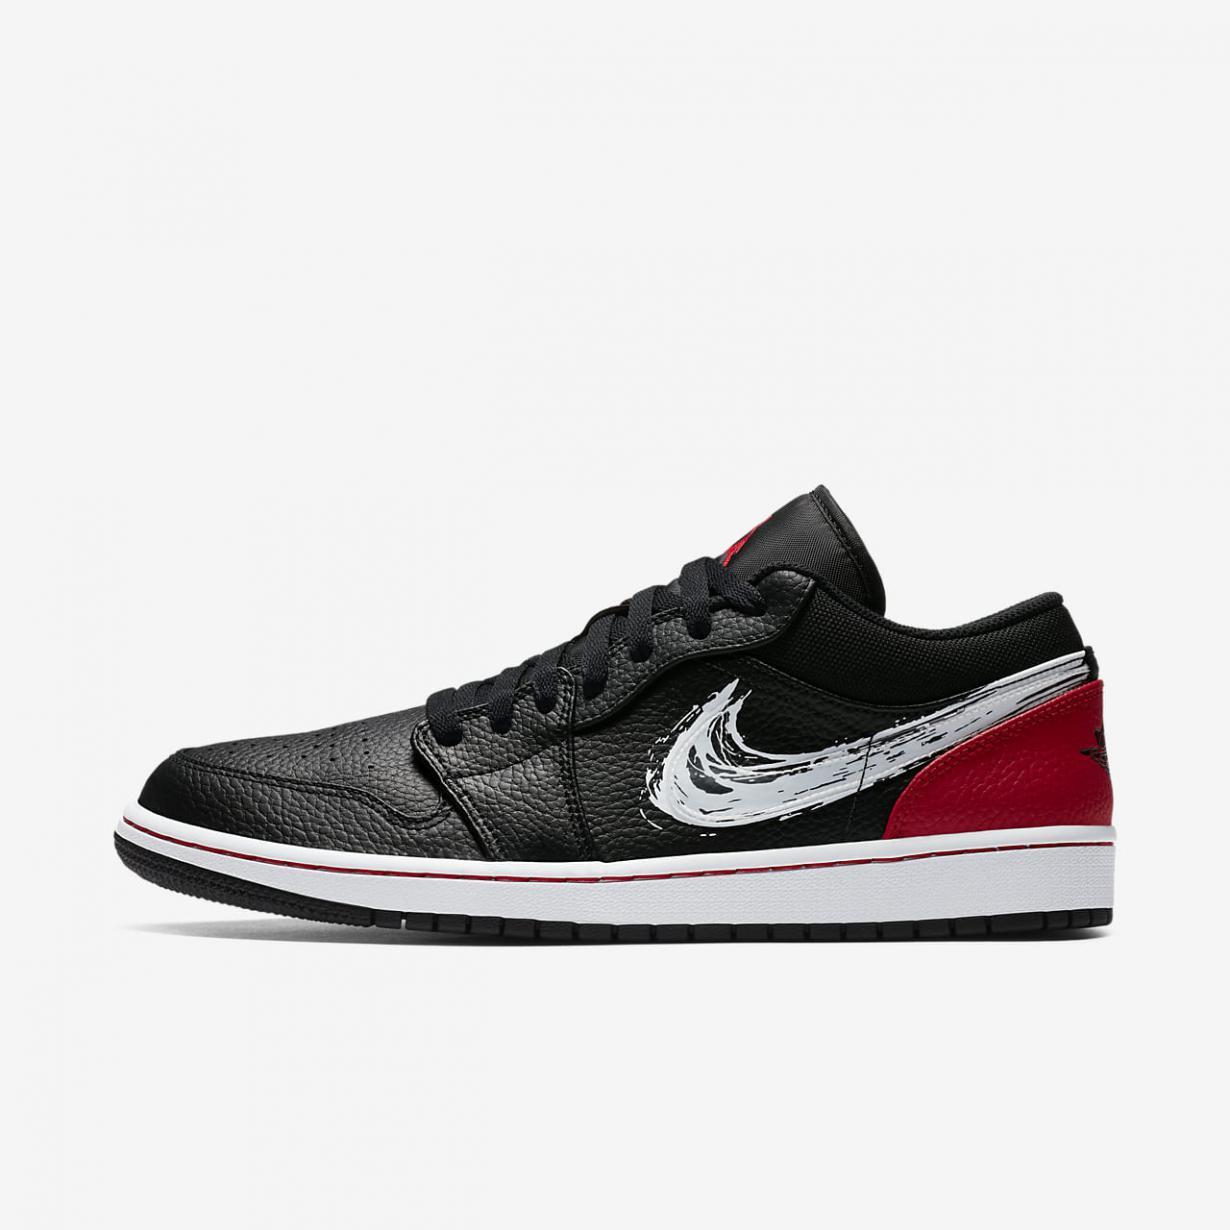 Air Jordan 1 < Nike En Ligne Pas Cher Vente - FR < Gooddaytricities